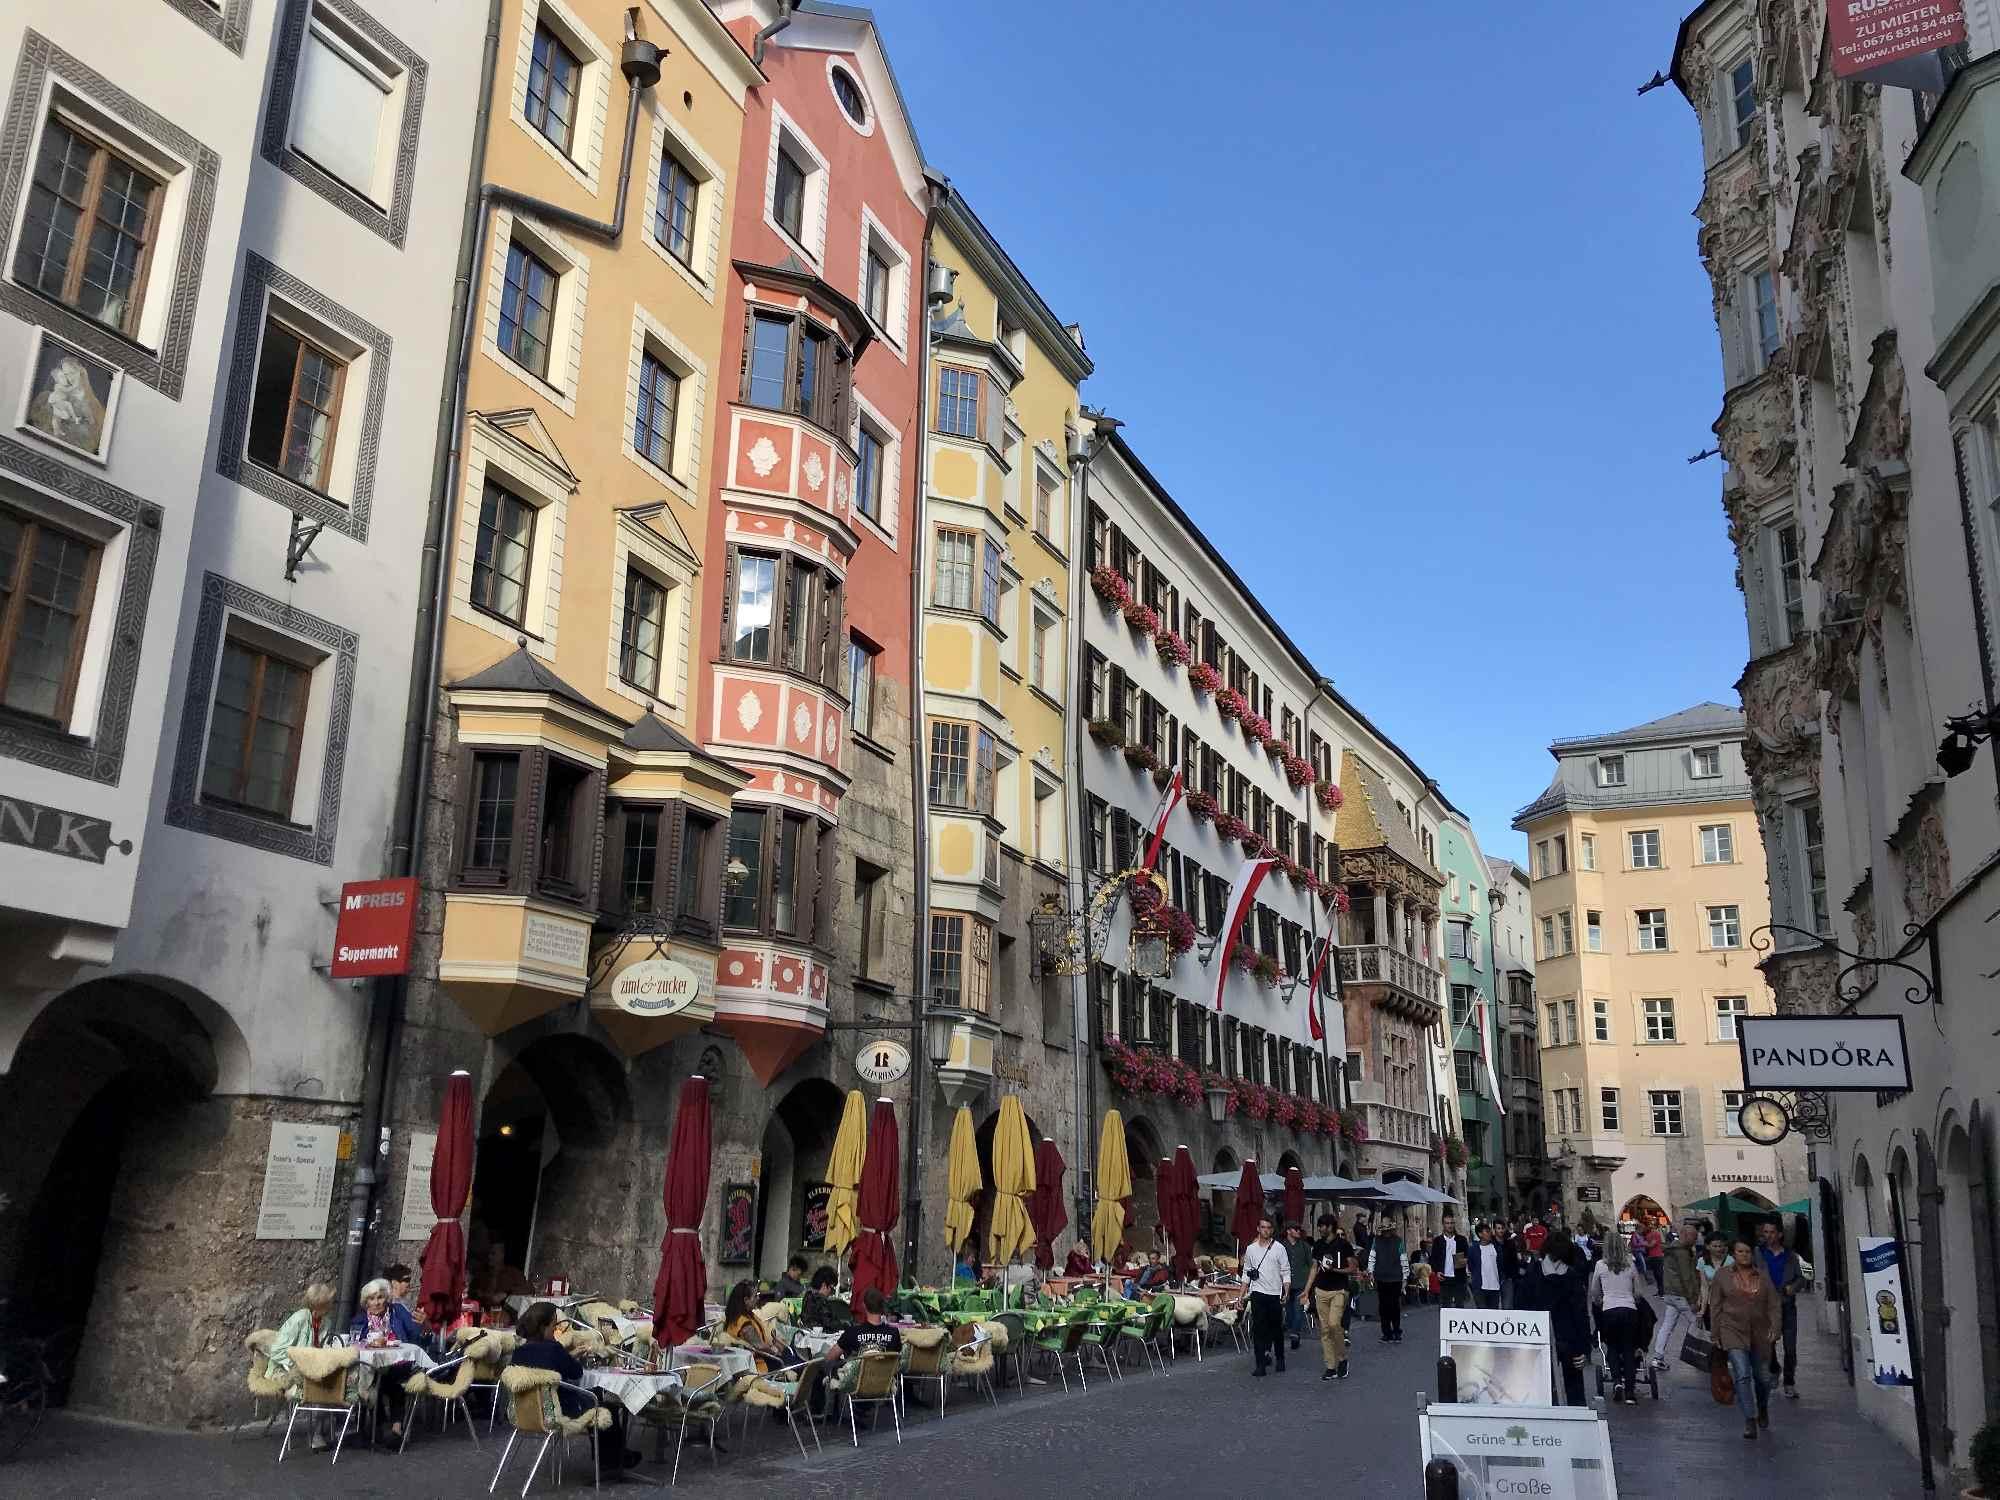 Bummel durch die Altstadt Innsbruck